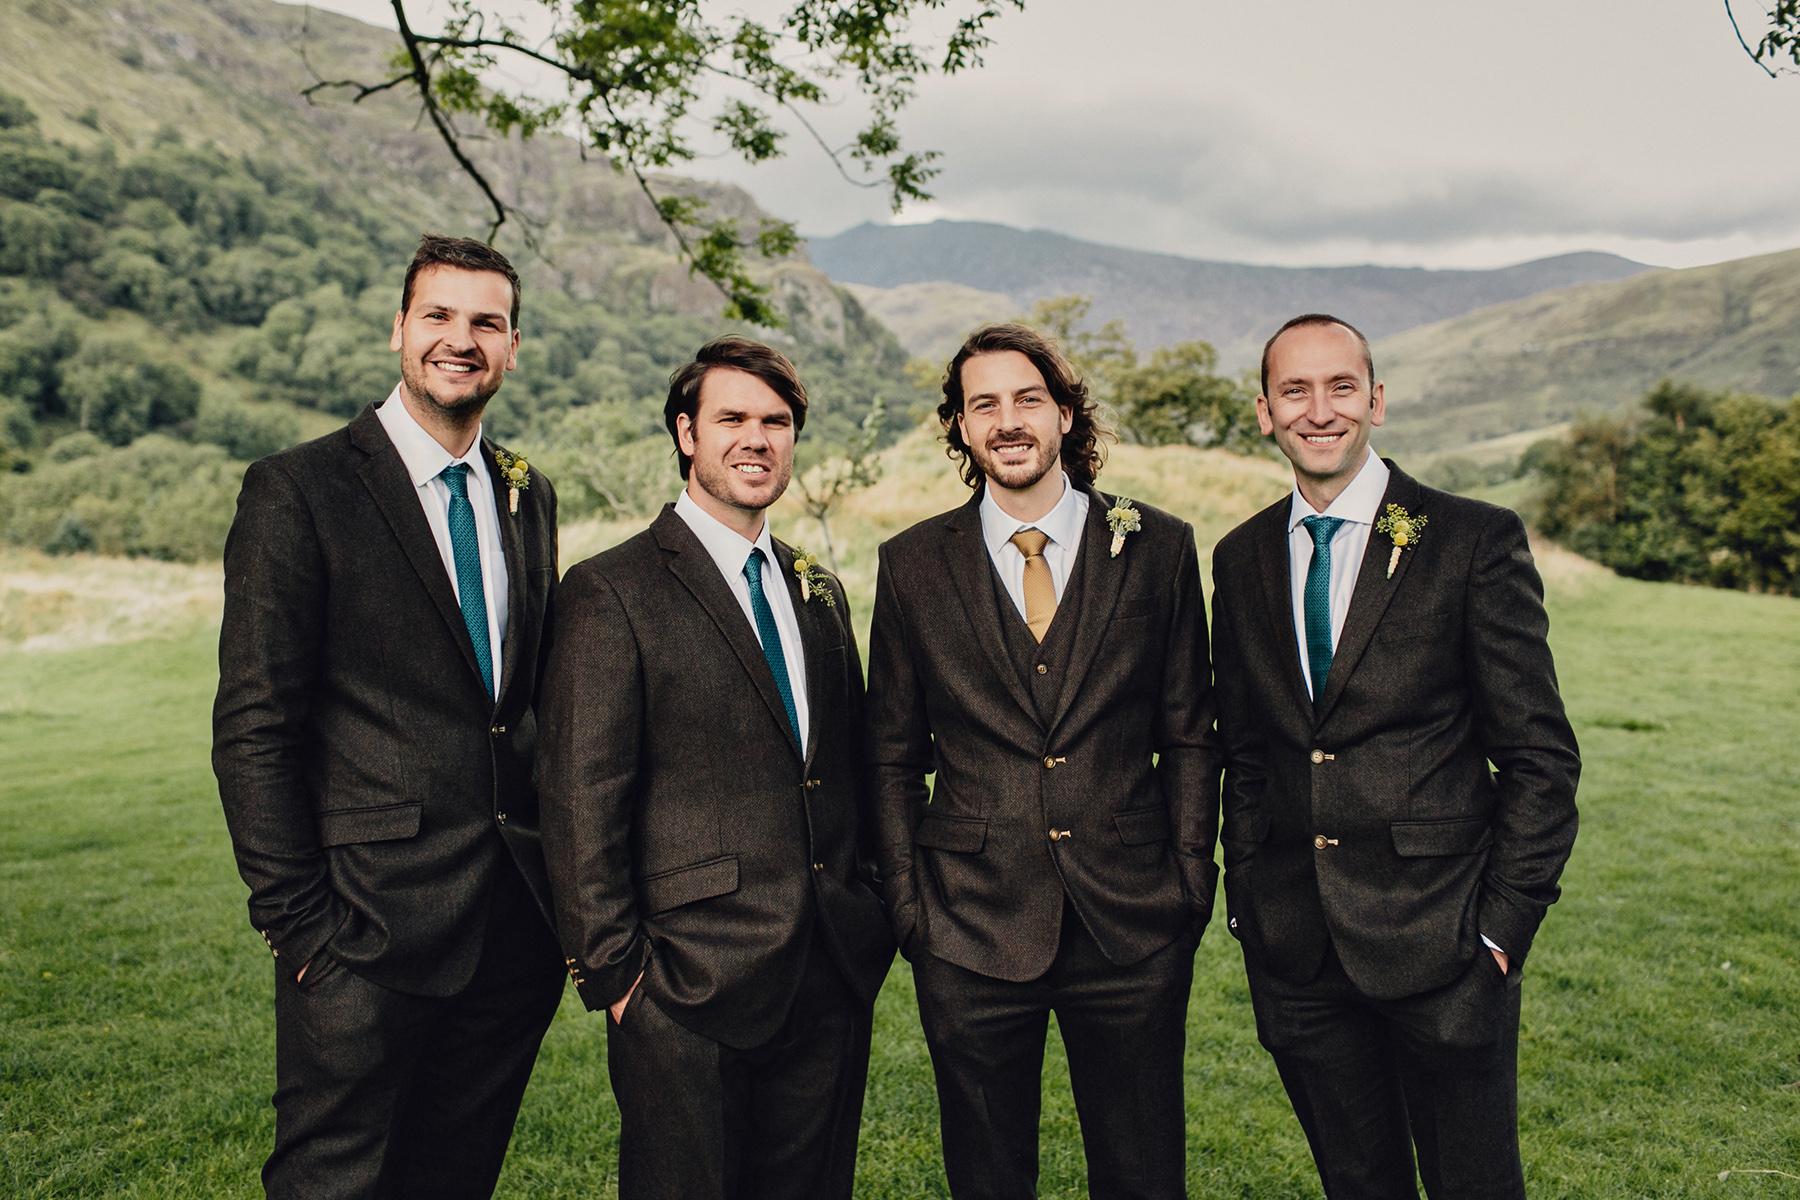 Snowdonia-Wales-Wedding-Photos-0346.jpg